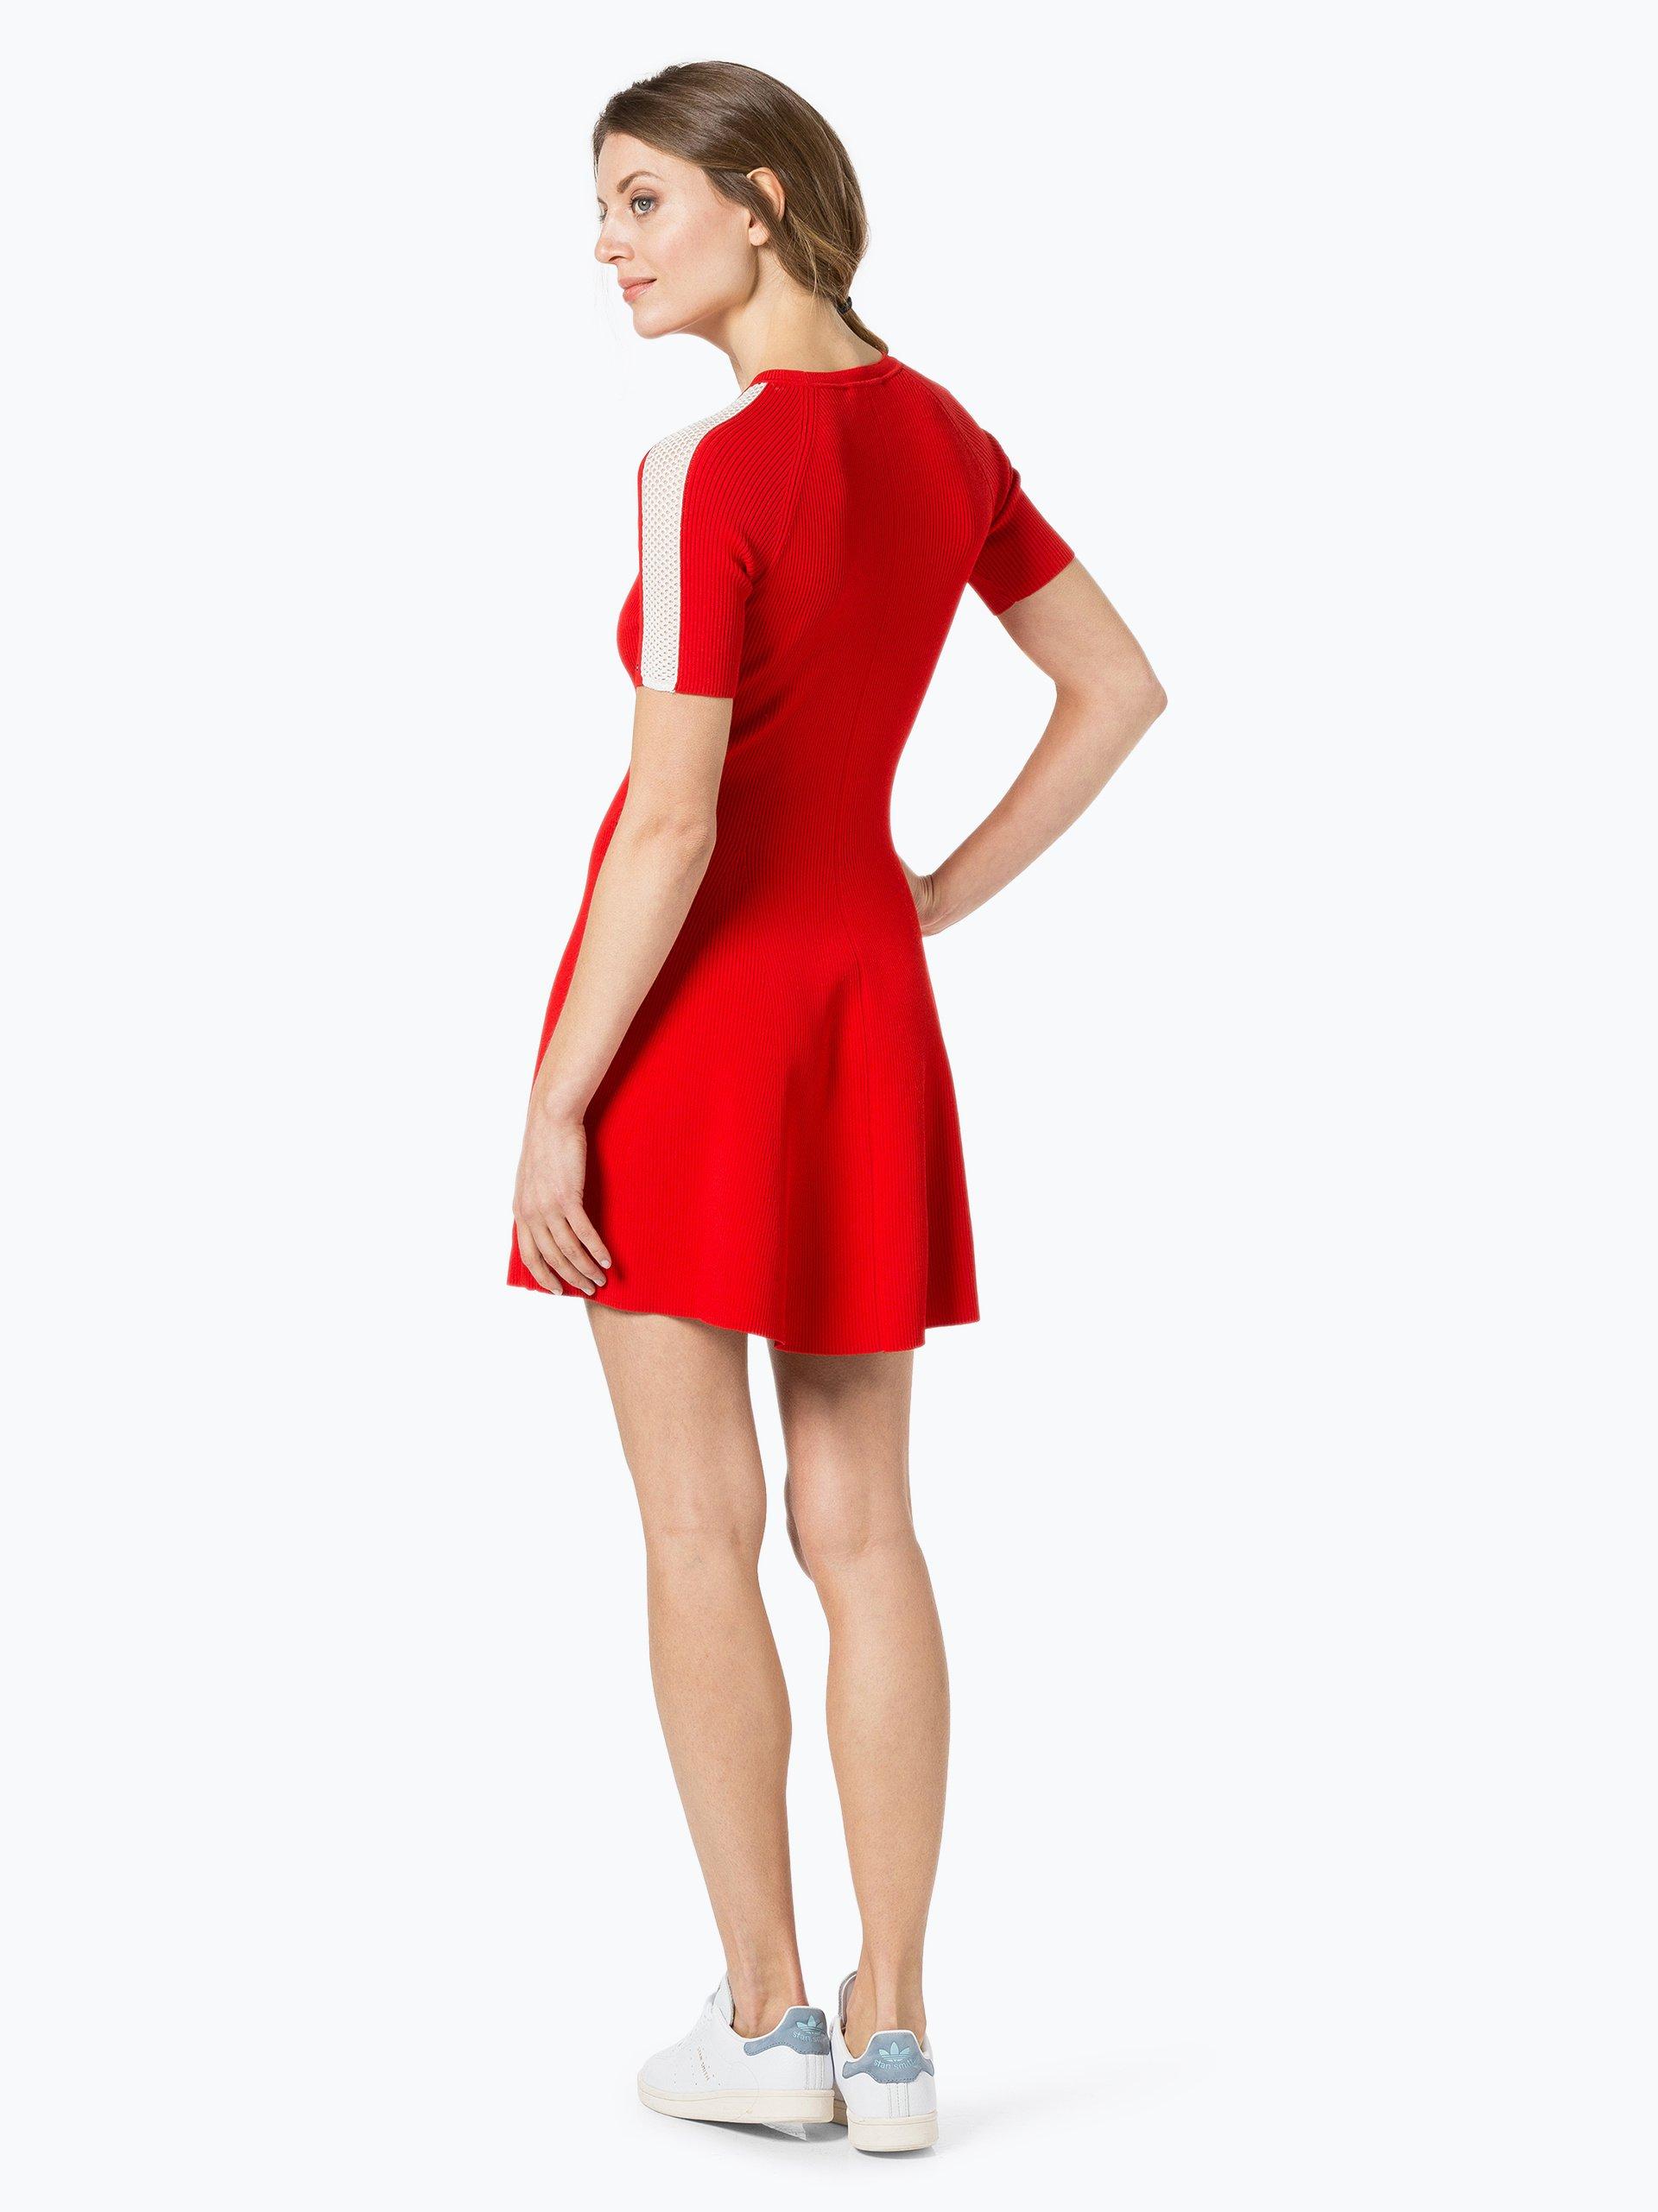 tommy hilfiger damen kleid rot uni online kaufen peek. Black Bedroom Furniture Sets. Home Design Ideas